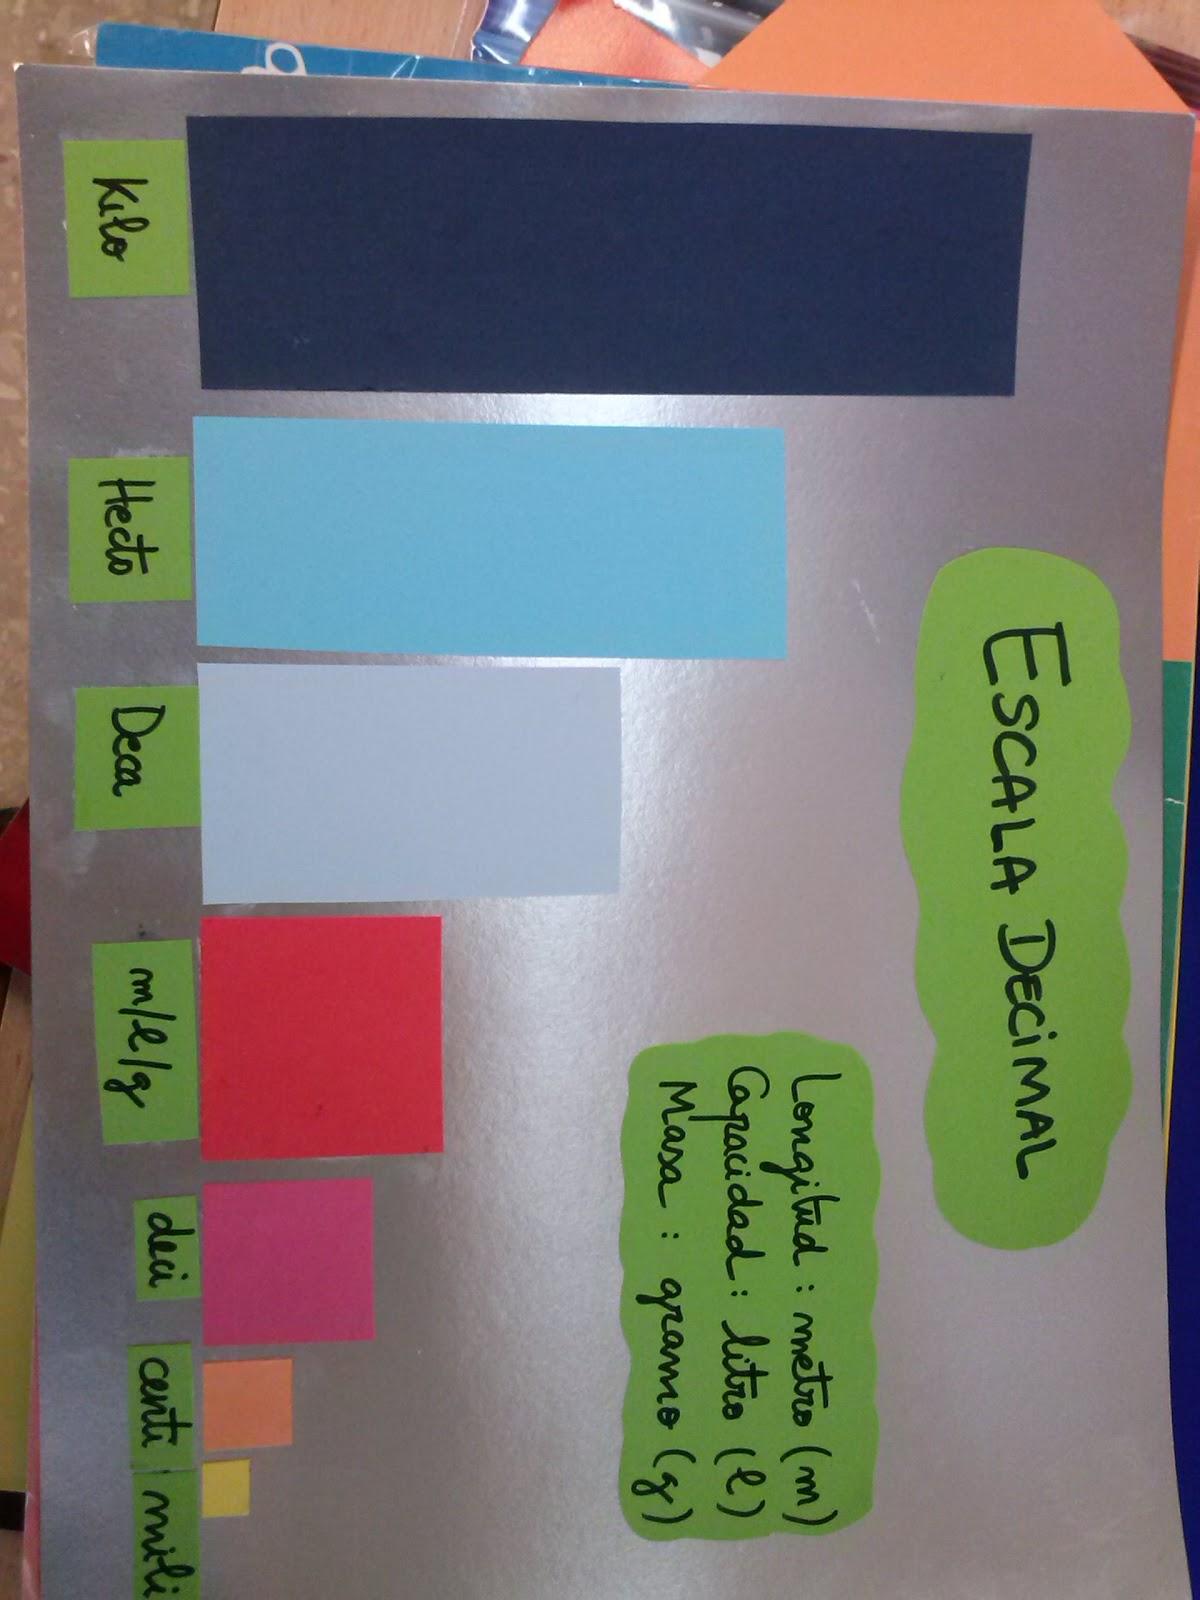 Experiencias compartidas escala de medidas for Escala de medidas